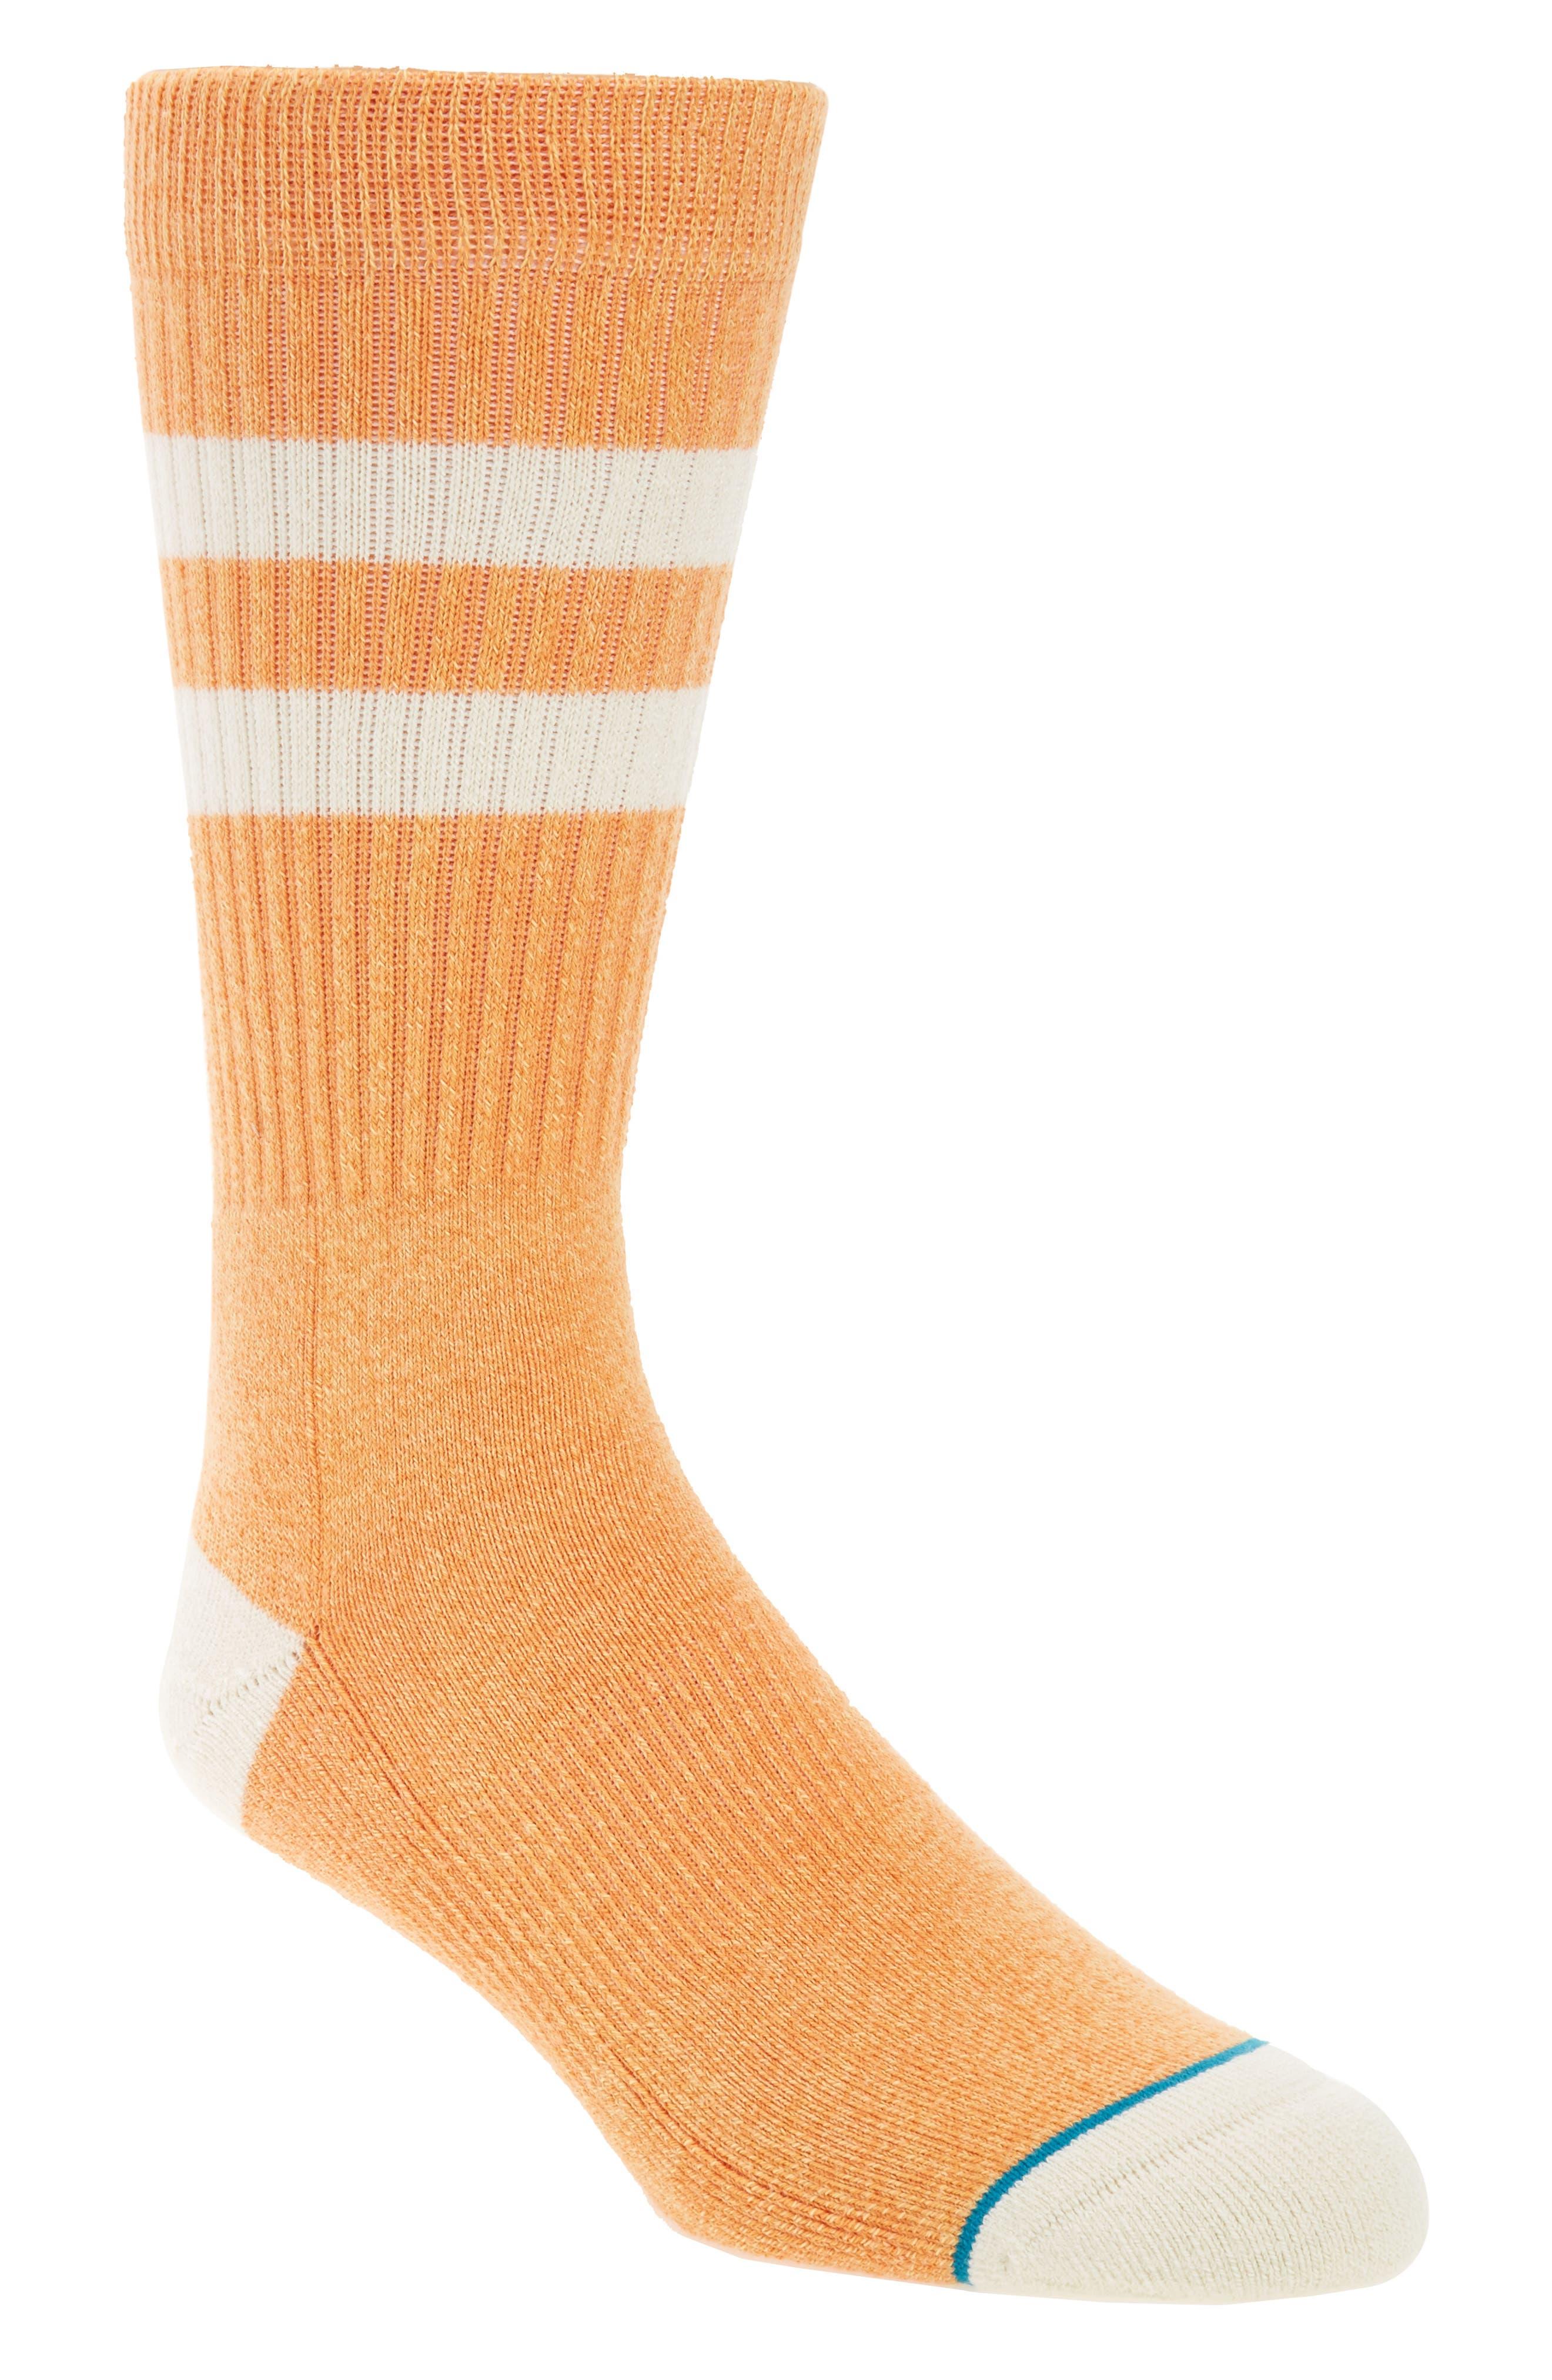 Salty Crew Socks,                         Main,                         color, 810